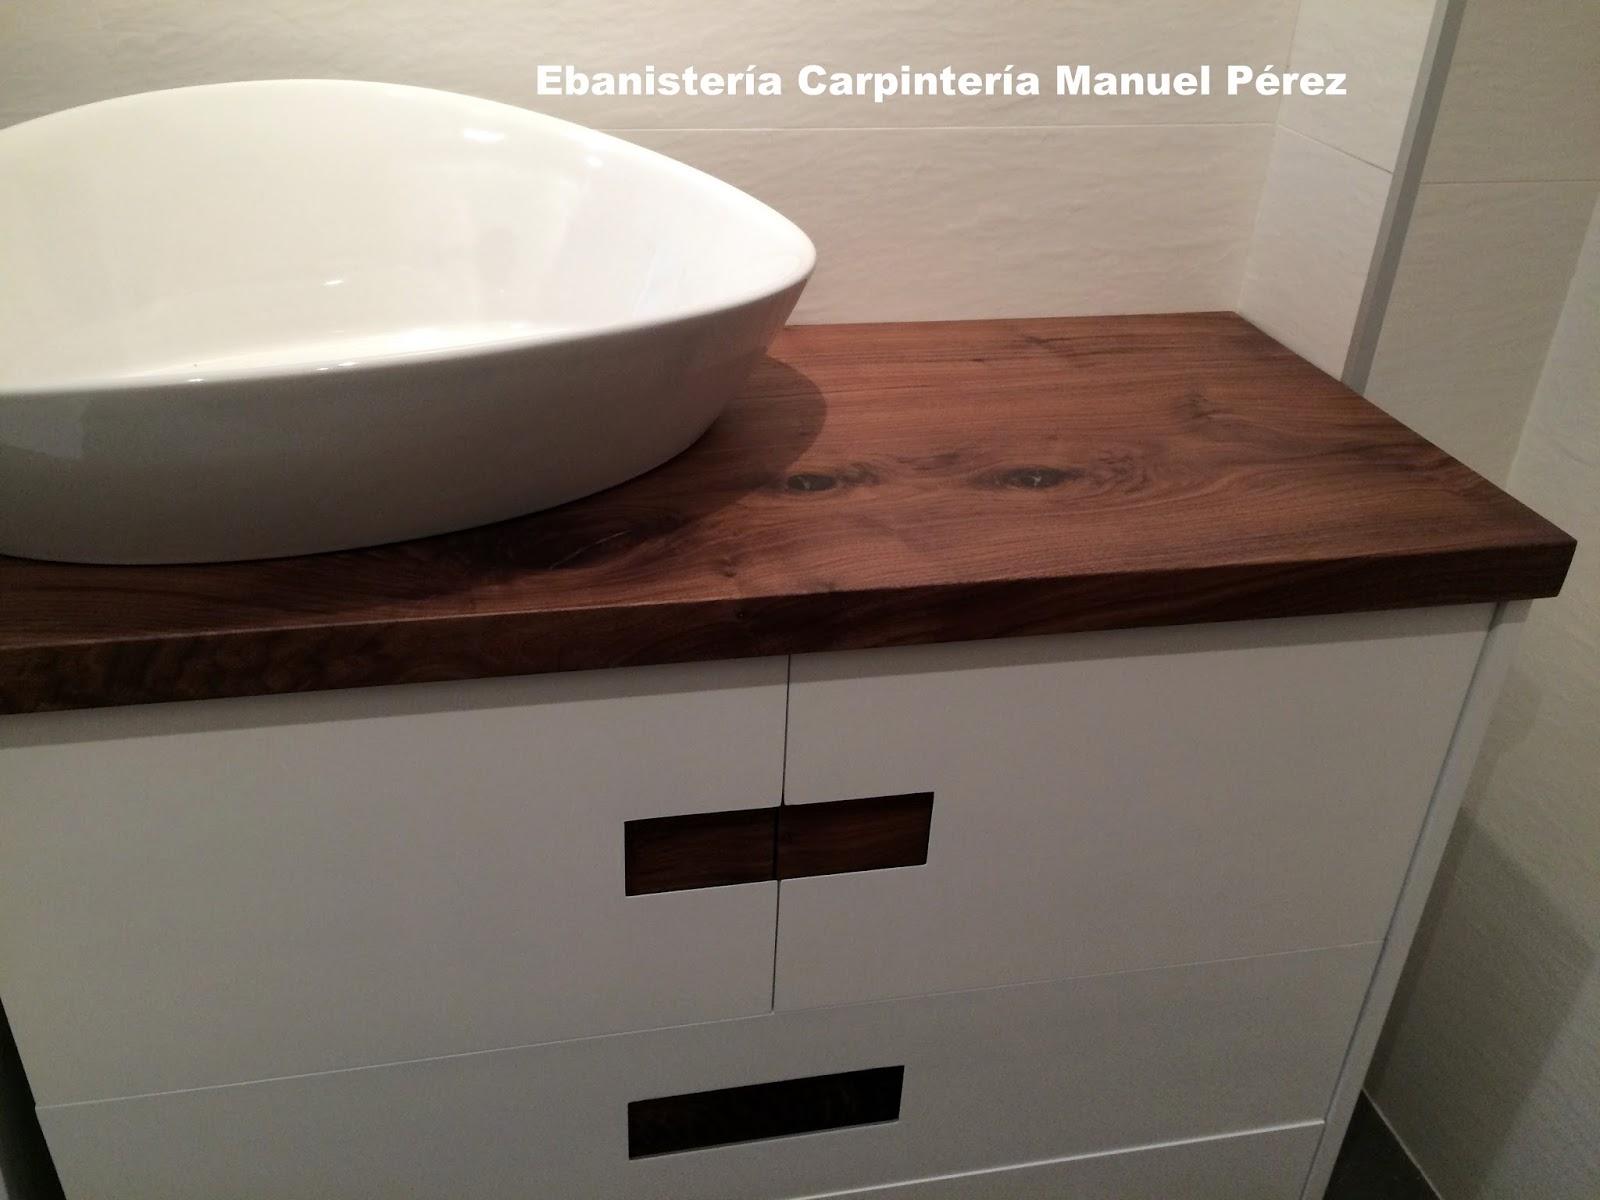 Ebanisteria carpinteria manuel perez zaragoza mueble - Encimeras de madera maciza ...